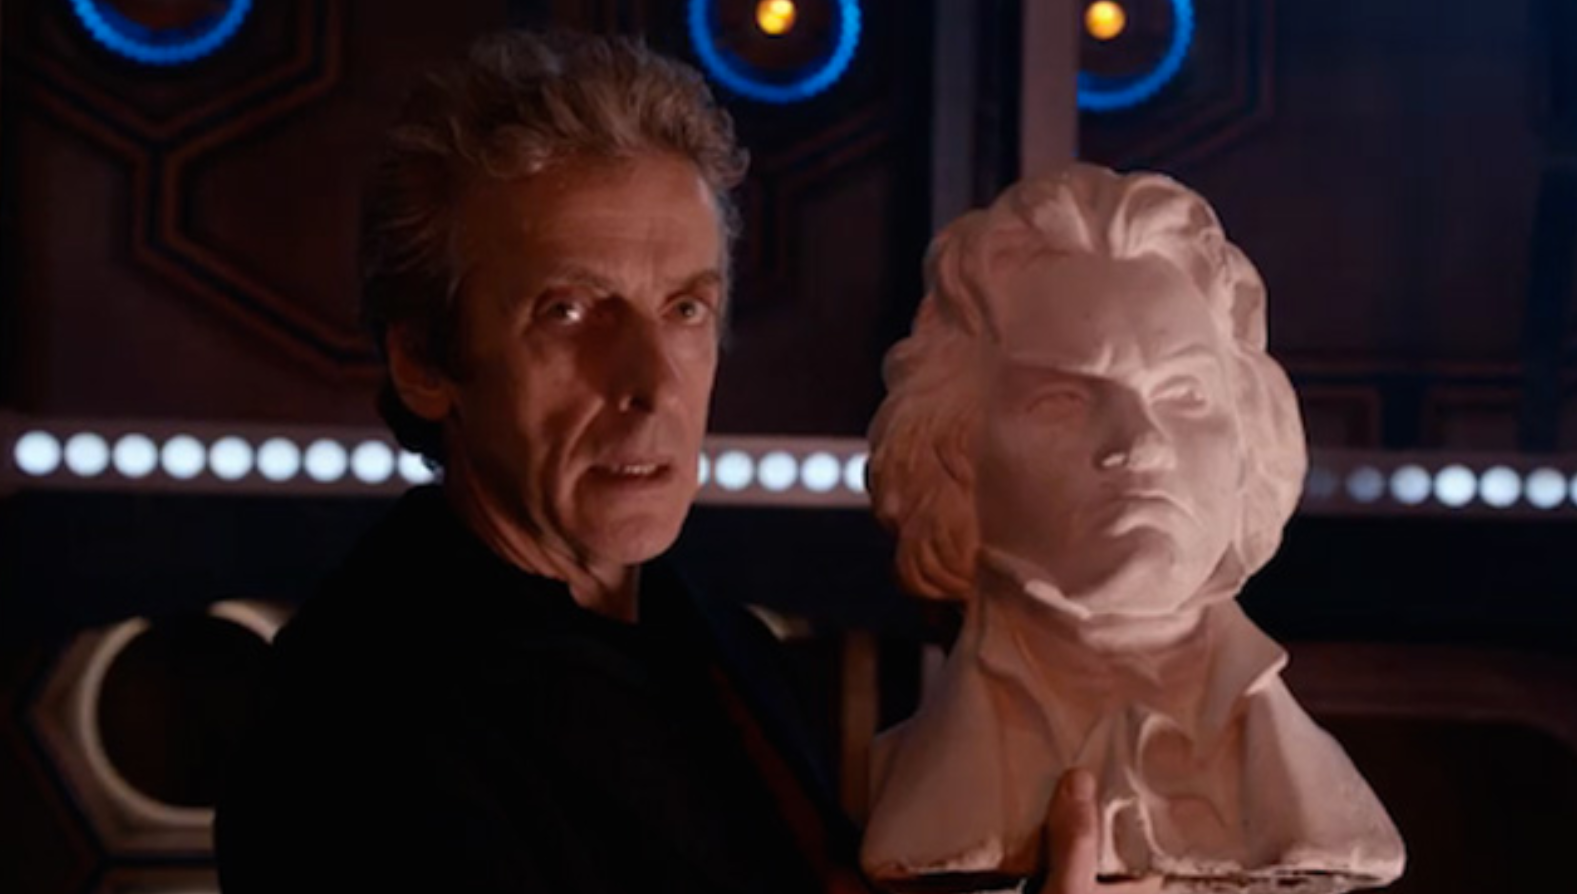 Peter Capaldi to Play Beethoven in Upcoming BBC Radio Drama